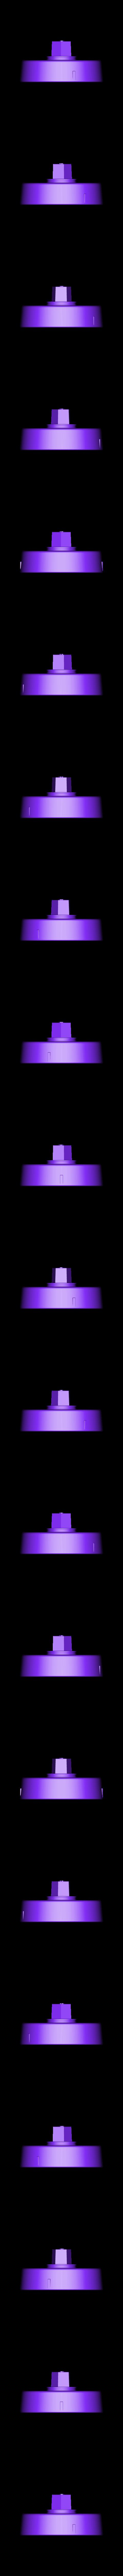 Fire hydrant v15_Fire hydrant v15_Large valve_.stl Download STL file Fire hydrant • Model to 3D print, AntonShtern